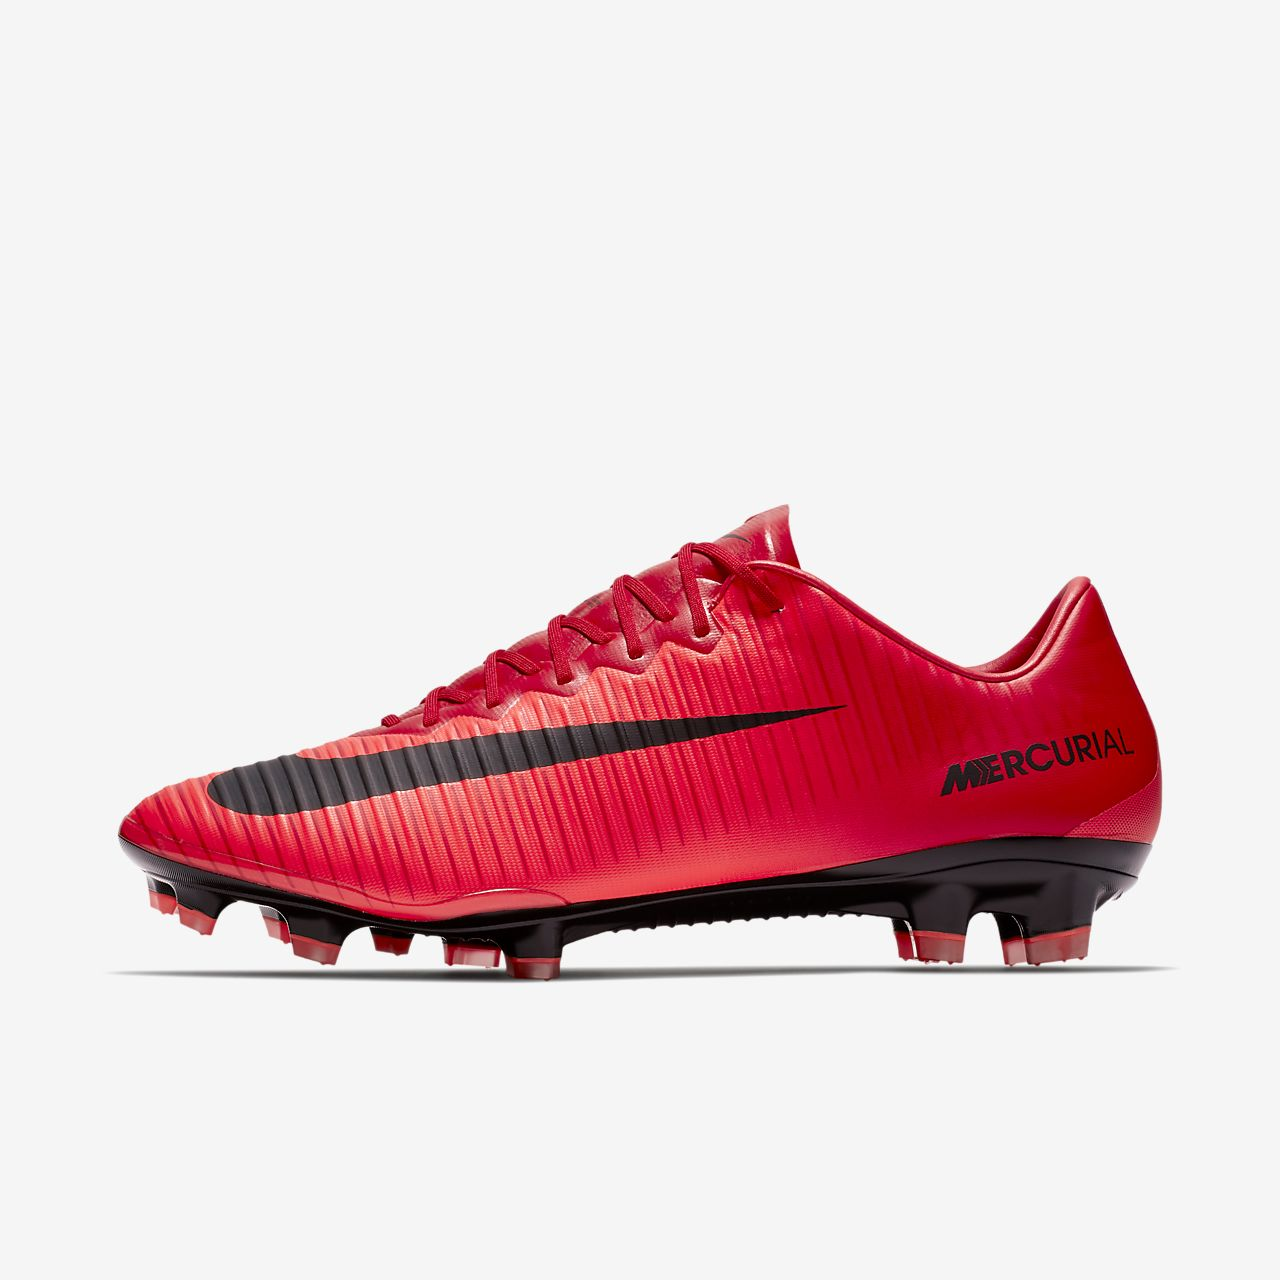 ... Nike Mercurial Vapor XI Firm-Ground Football Boot